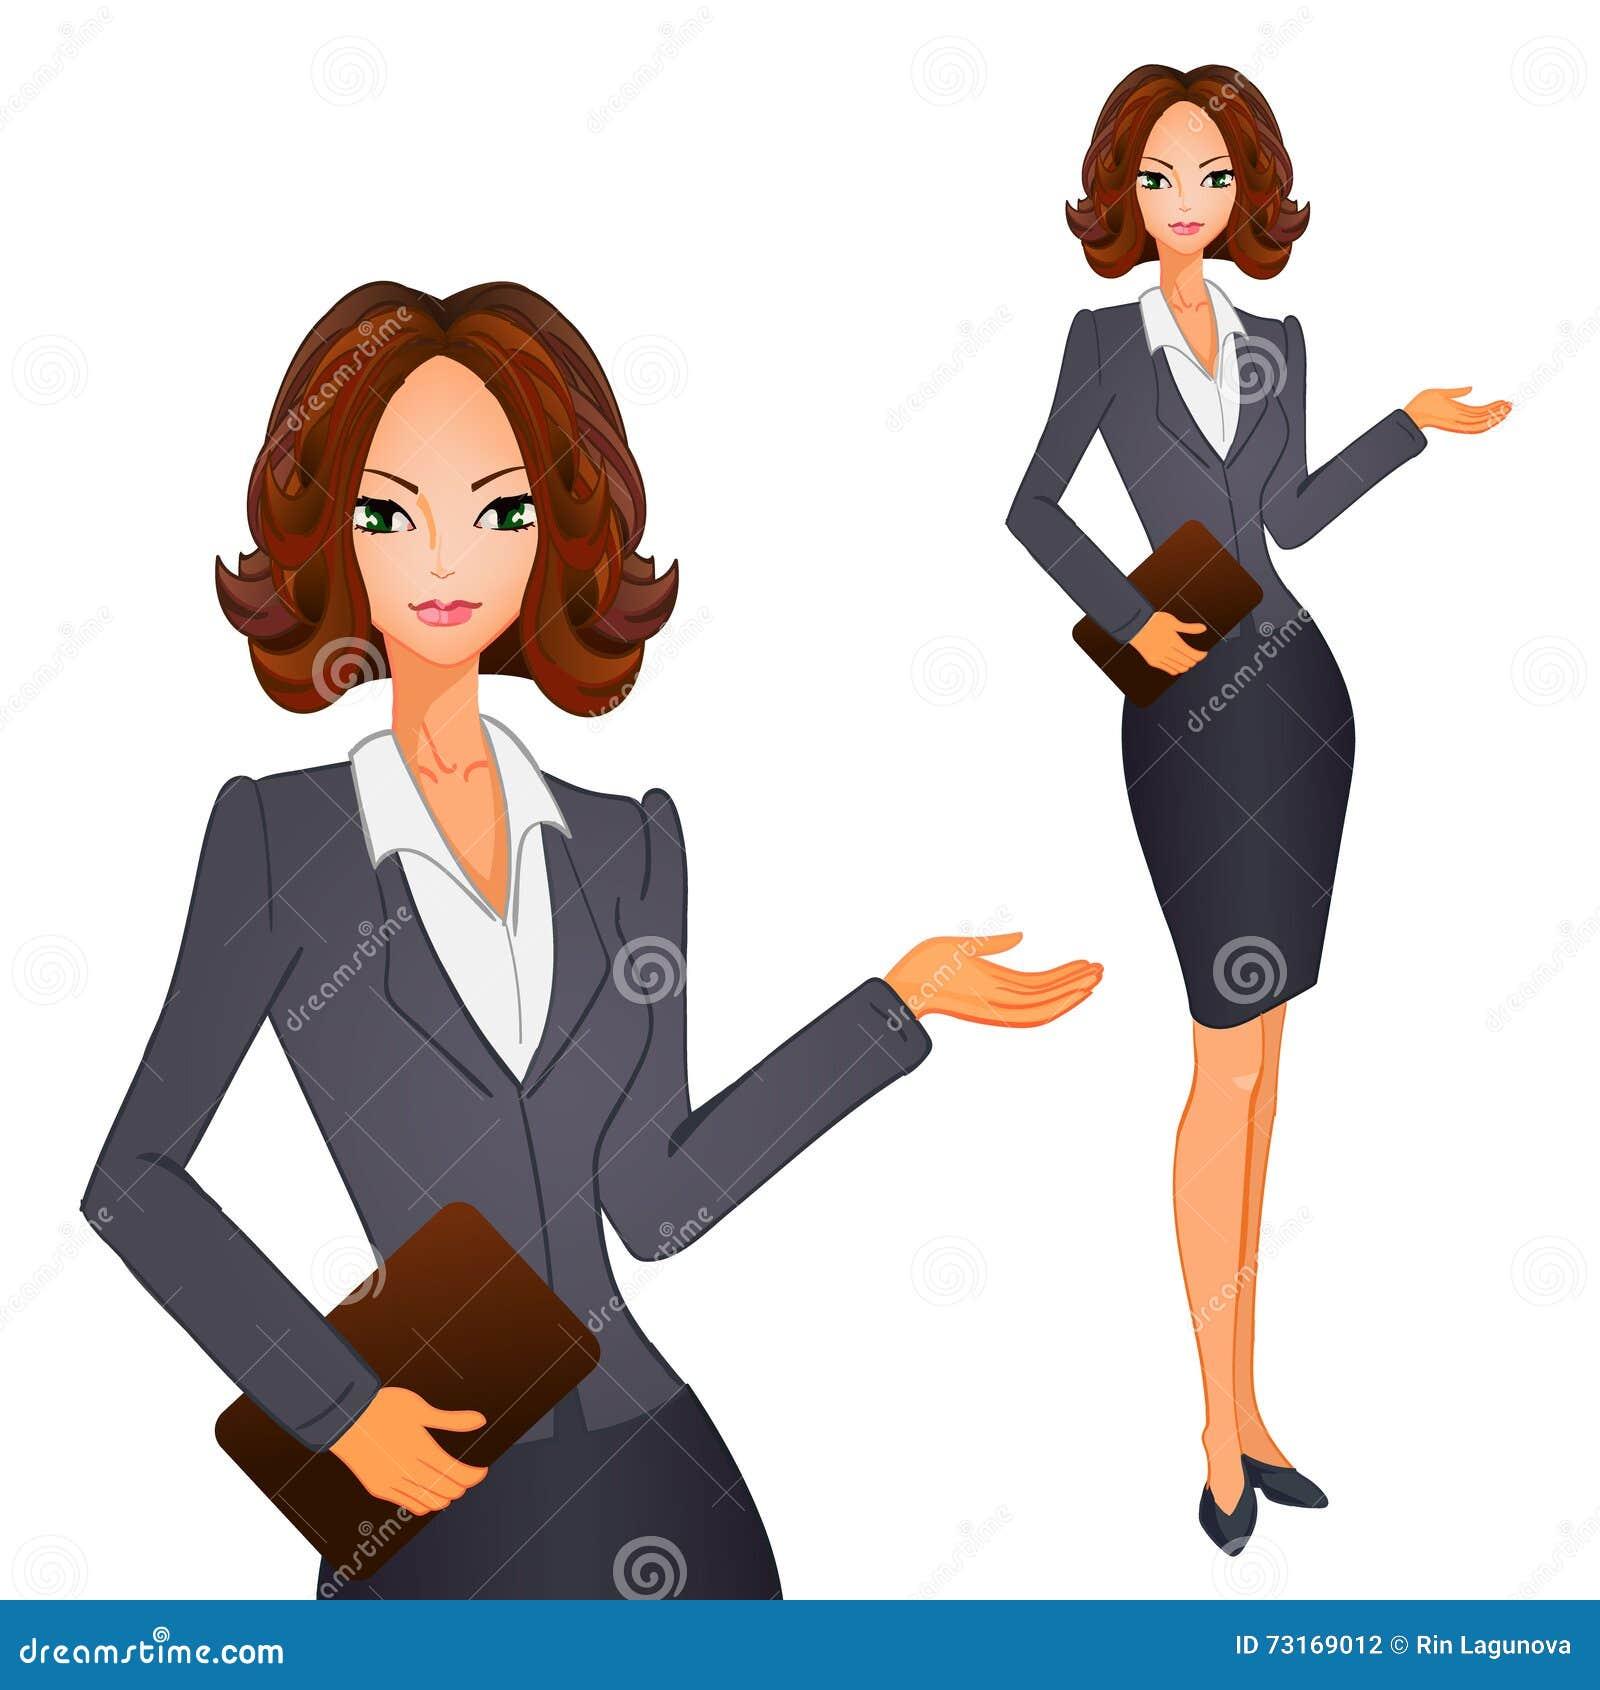 cartoon business women with brown short hair on grayblue